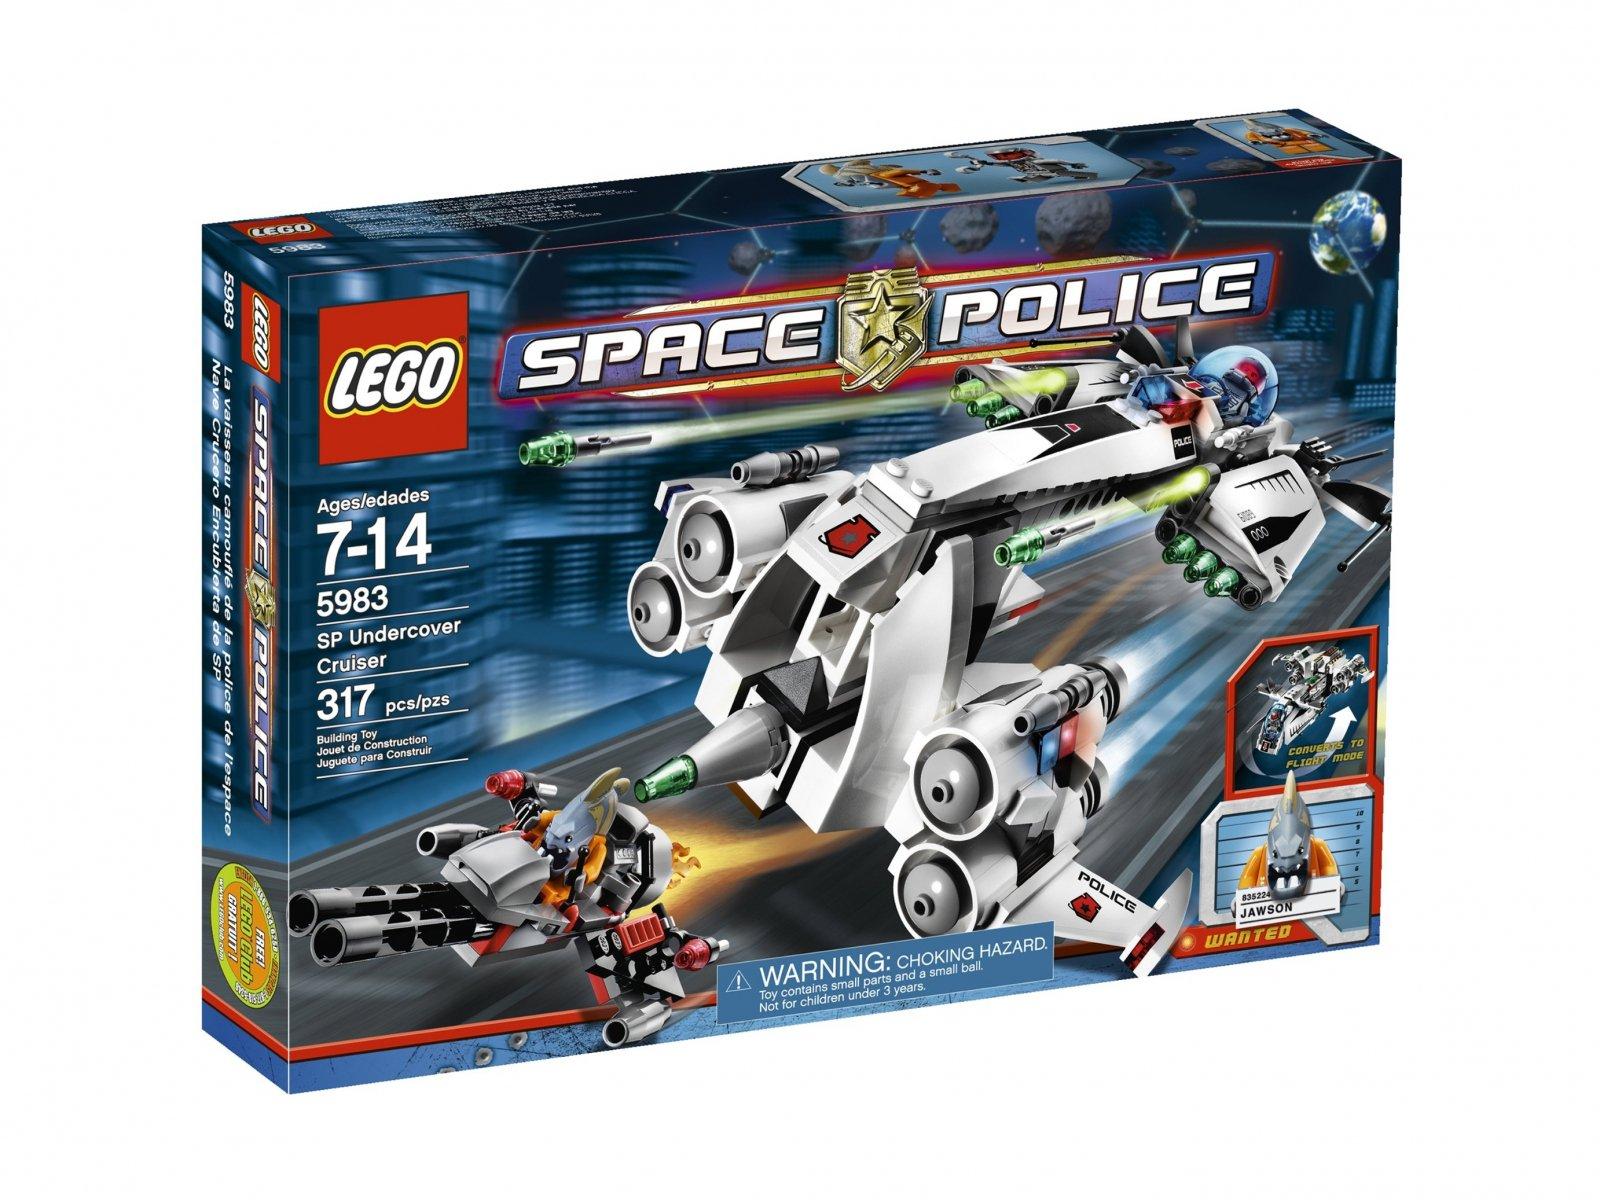 LEGO Space Police Undercover Cruiser 5983